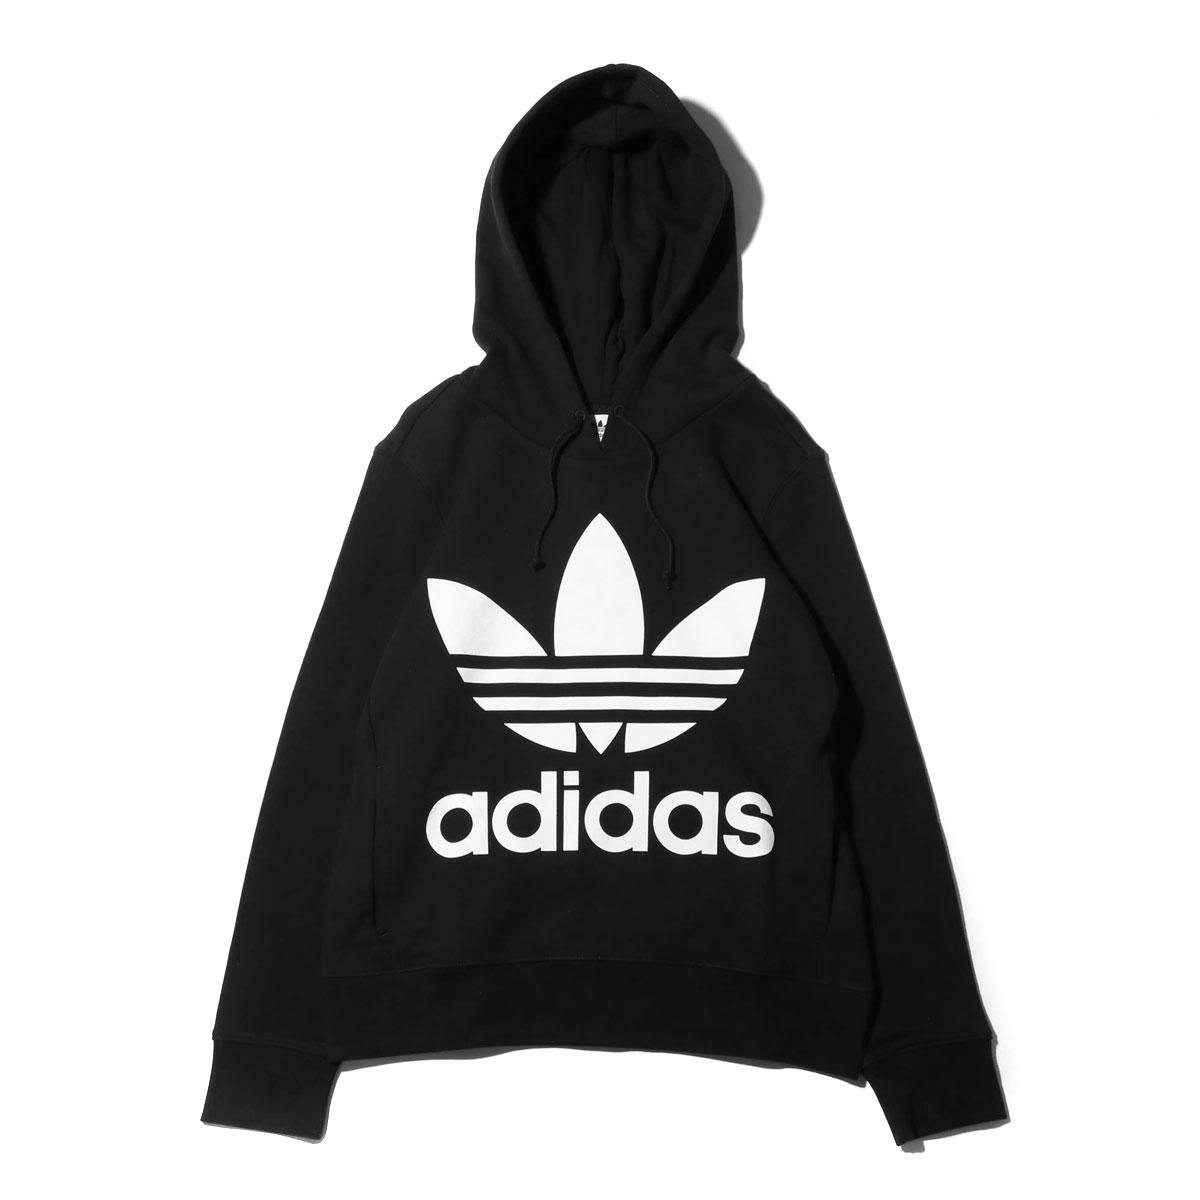 adidas Originals TREFOIL HOODIE(BLACK)(アディダスオリジナルス トレフォイル フーディー)【レディース】【パーカー】【19SS-I】